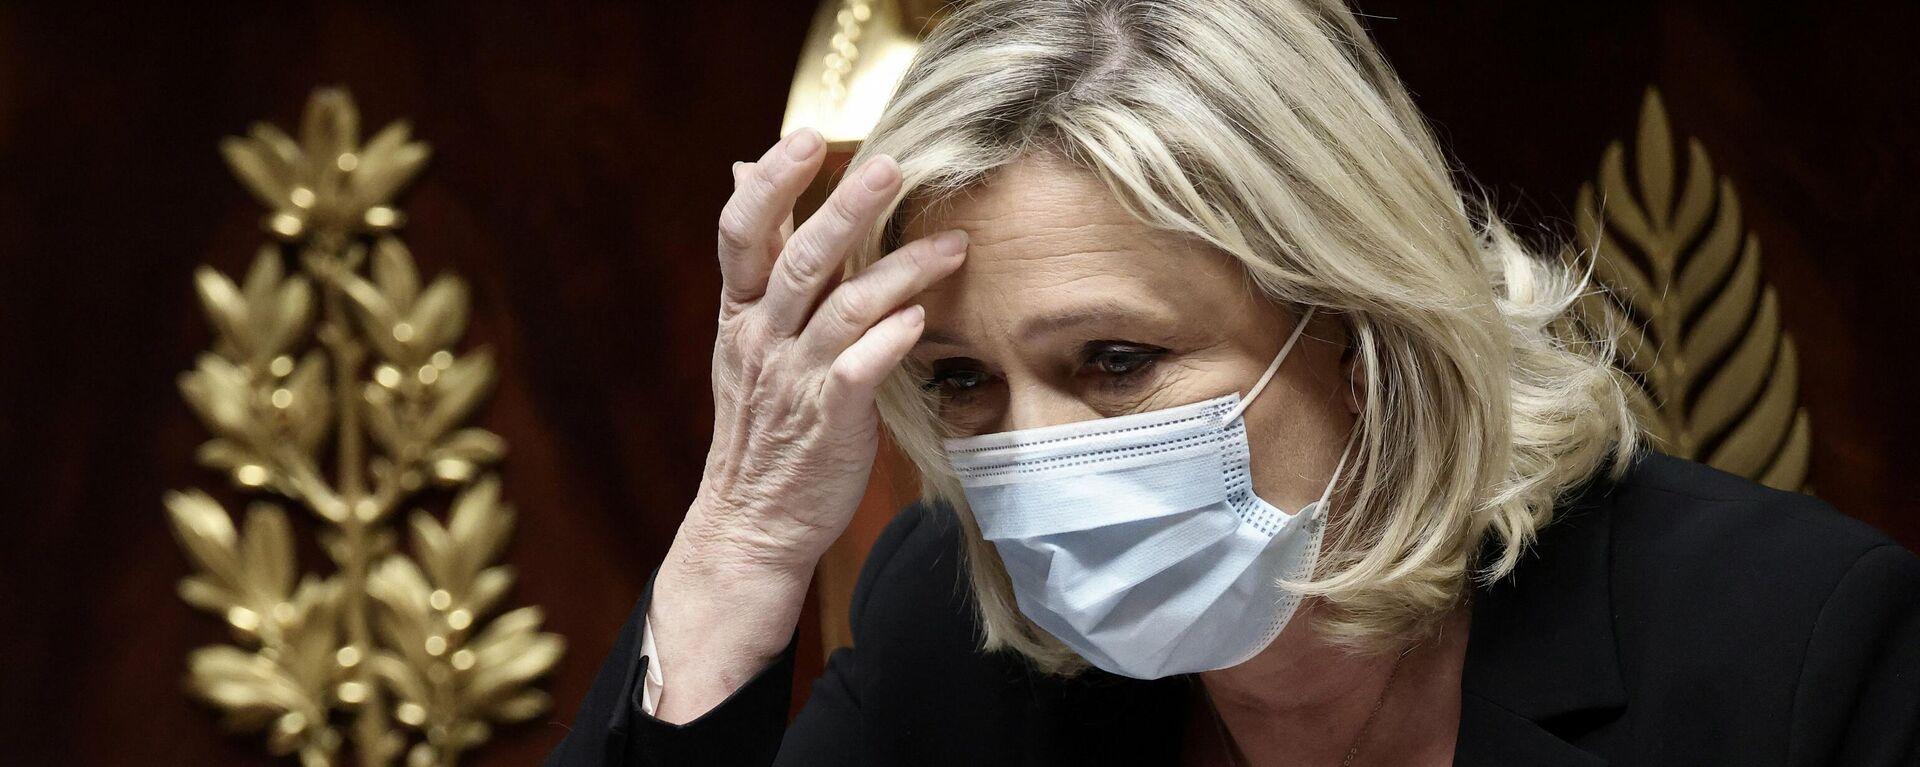 Marine Le Pen - SNA, 1920, 04.05.2021